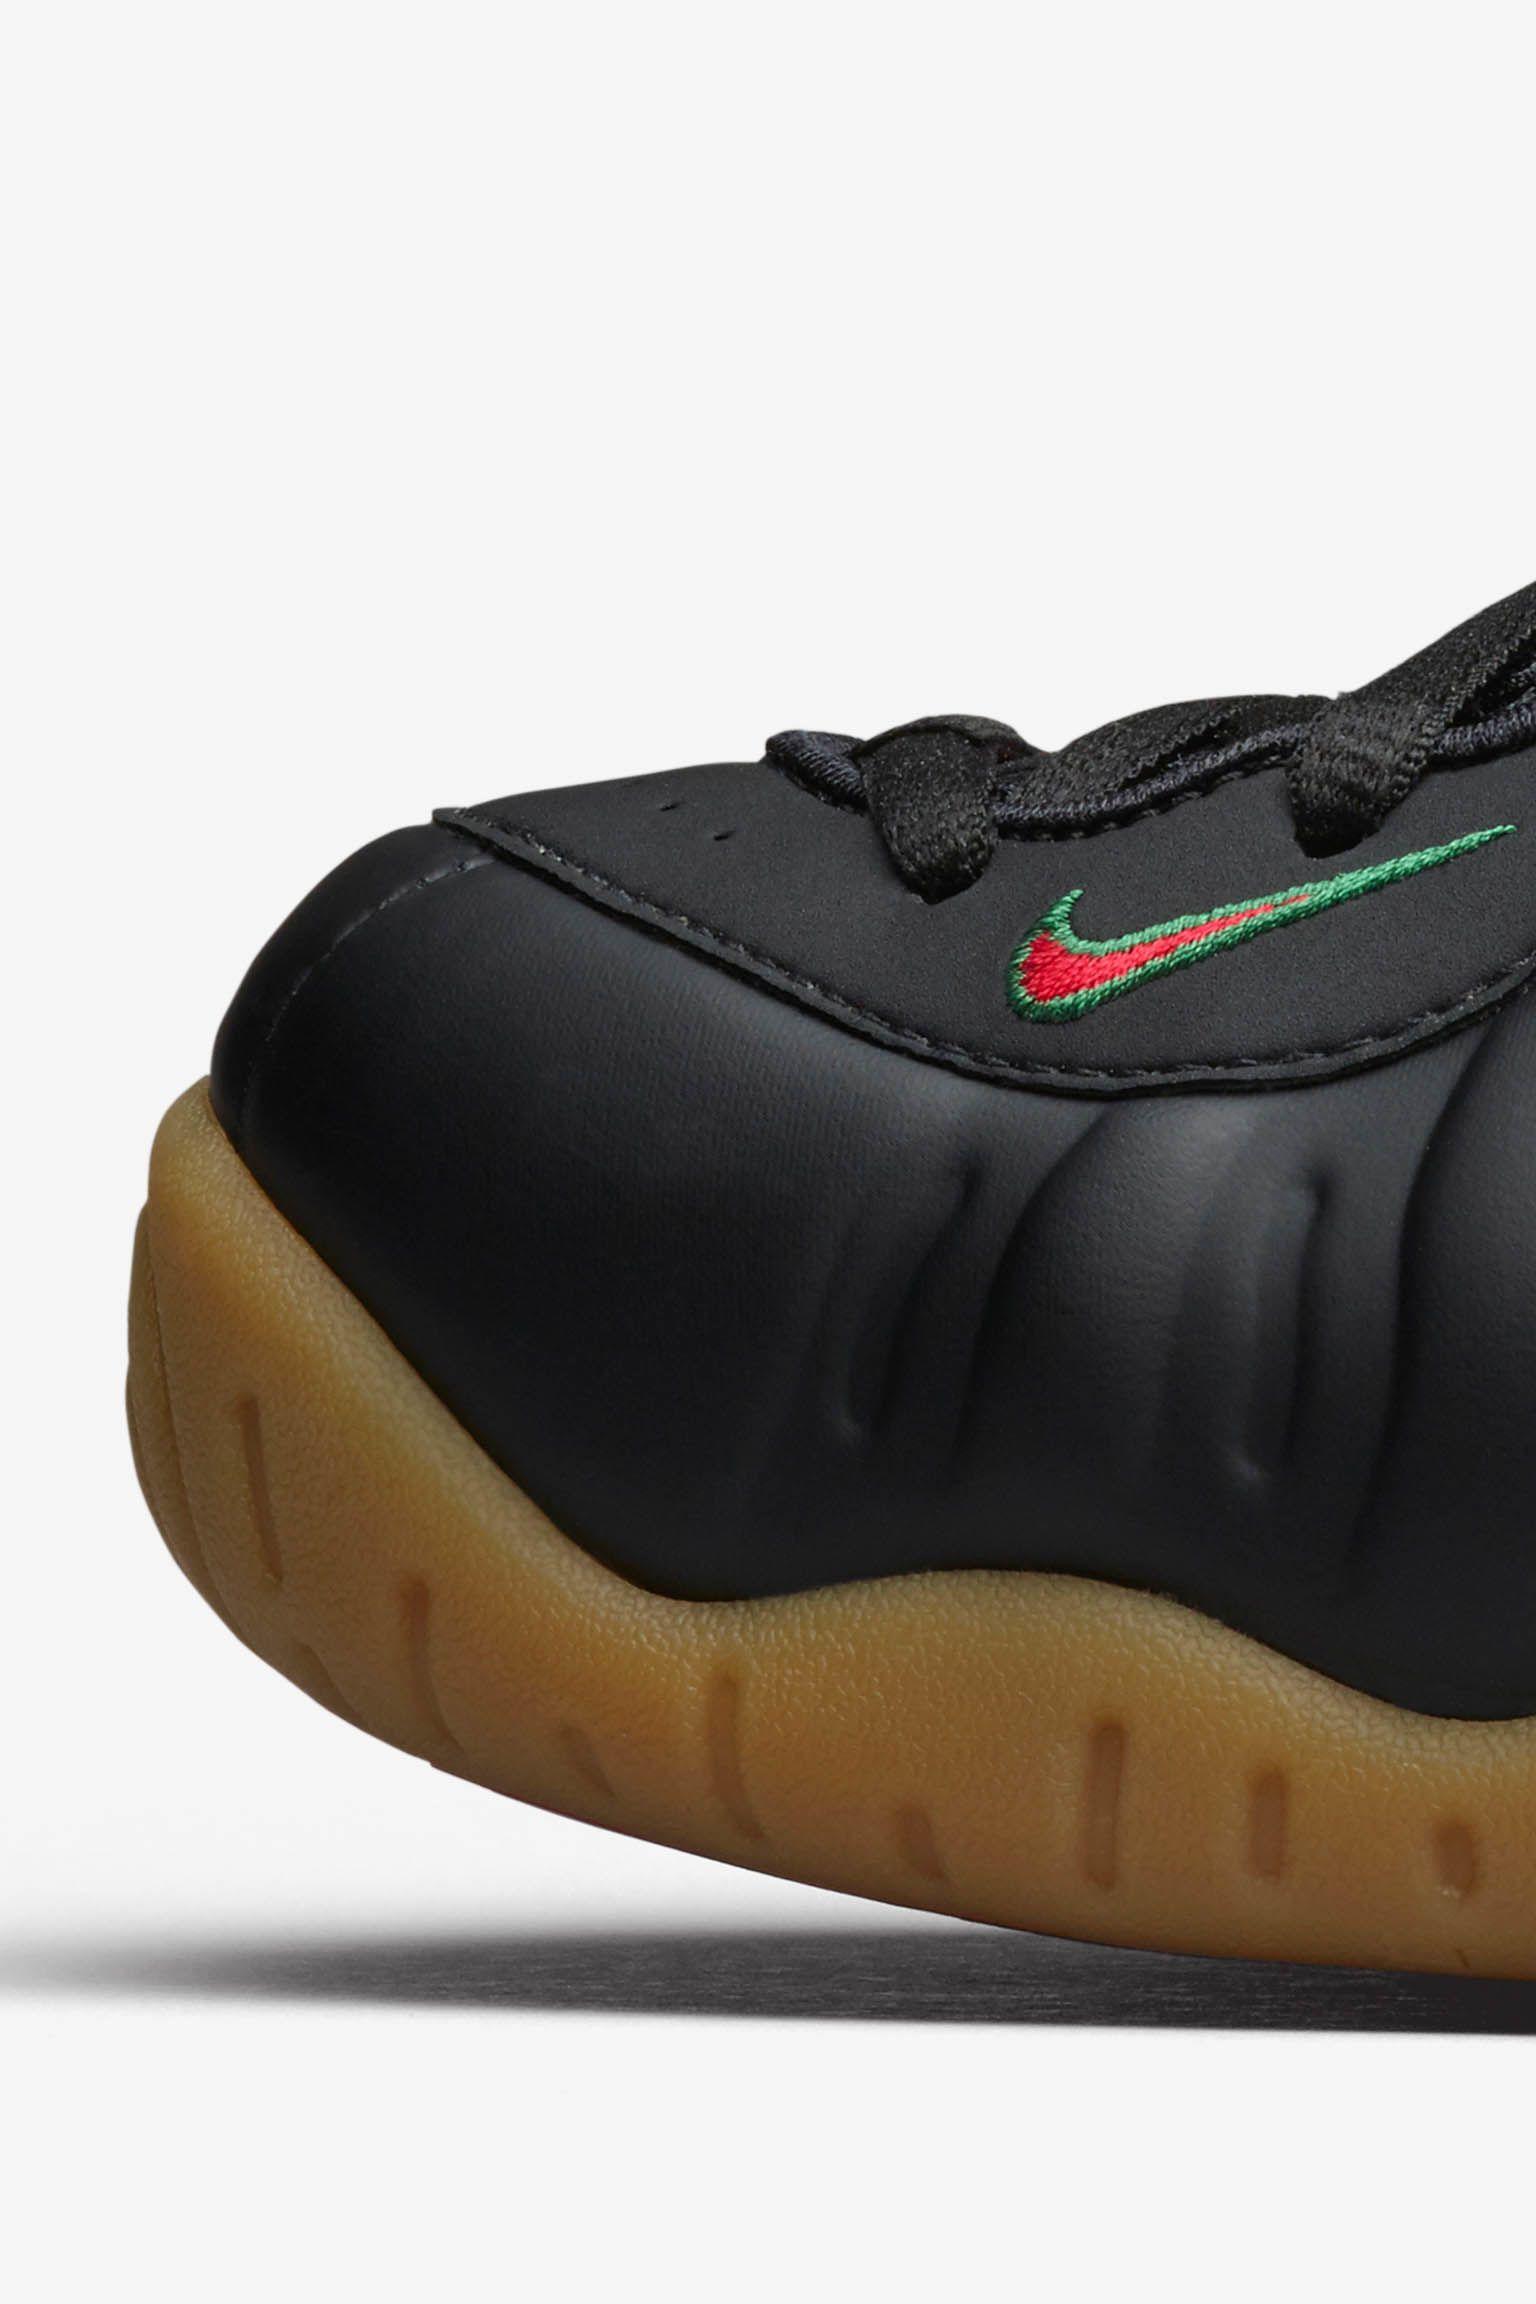 Nike Air Foamposite Pro 'Gorge Green' Release Date